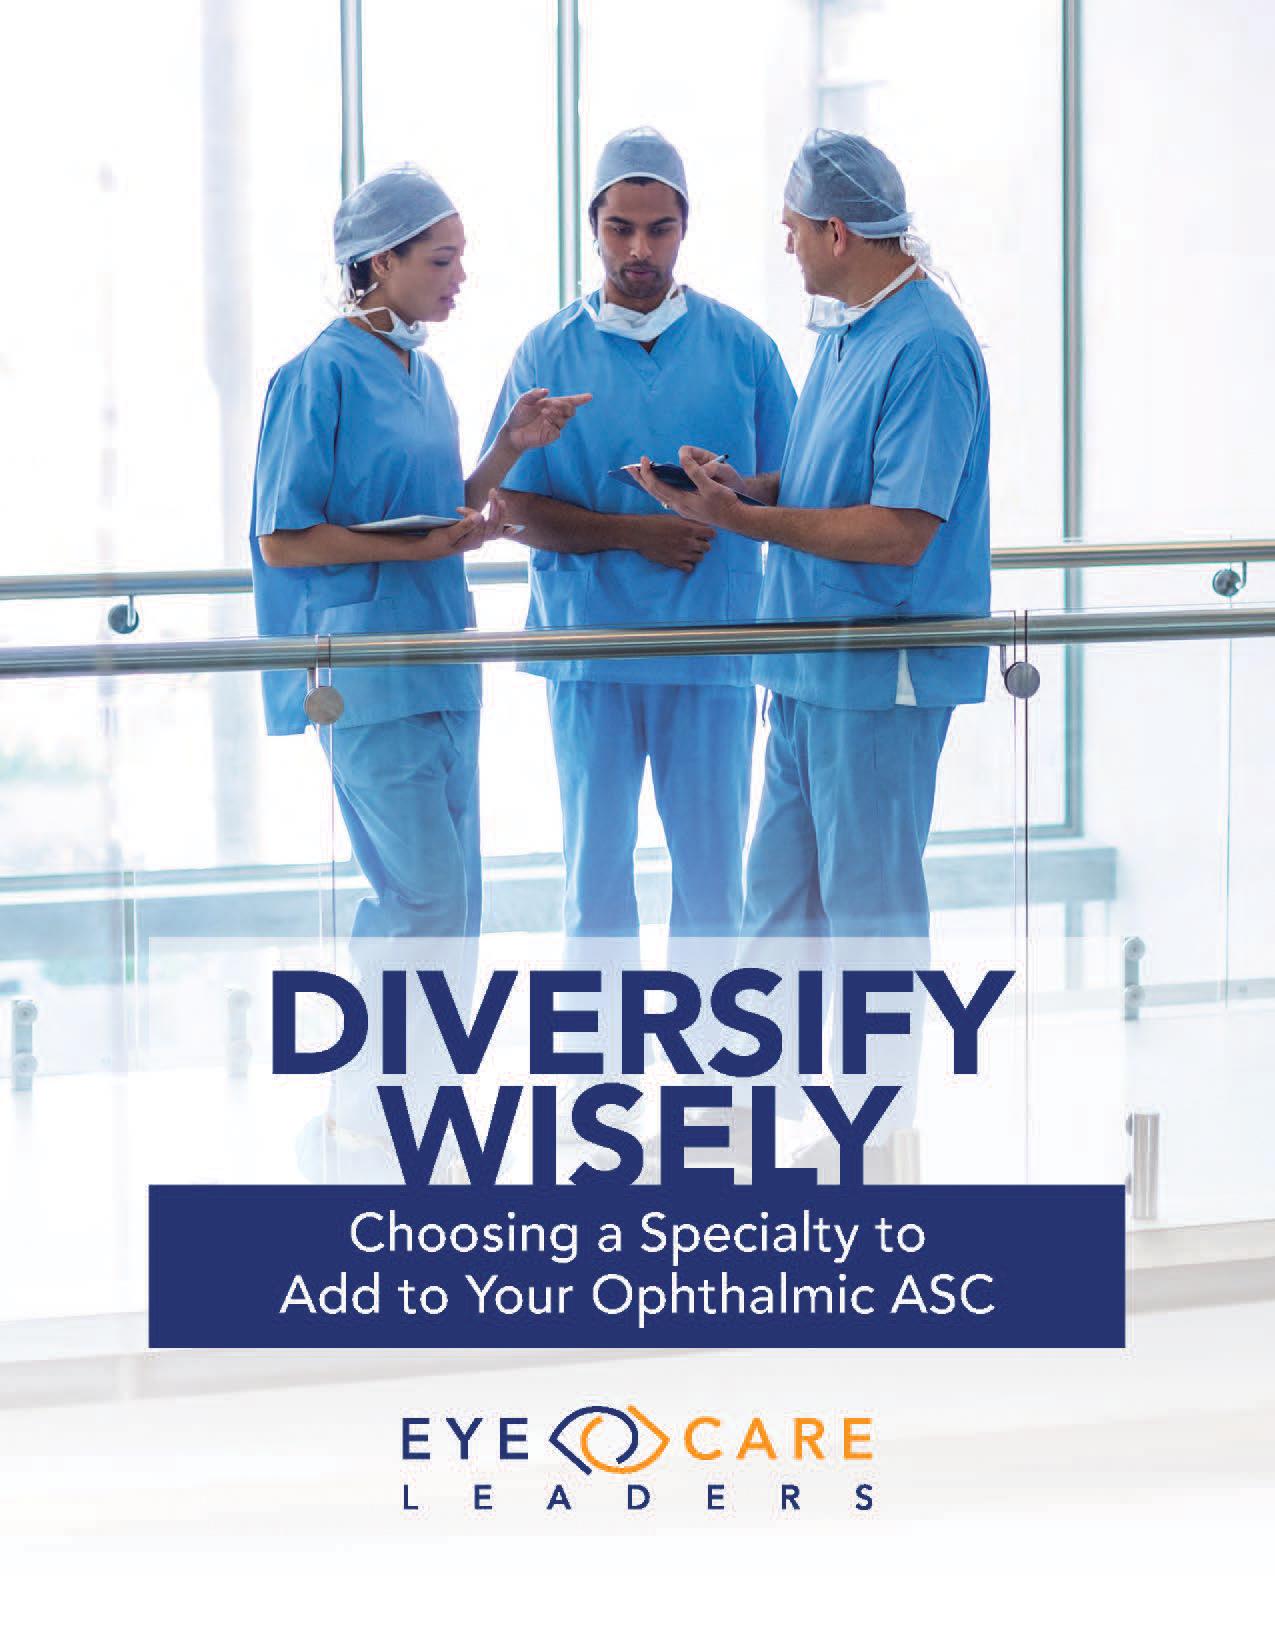 Ophthalmic ASC